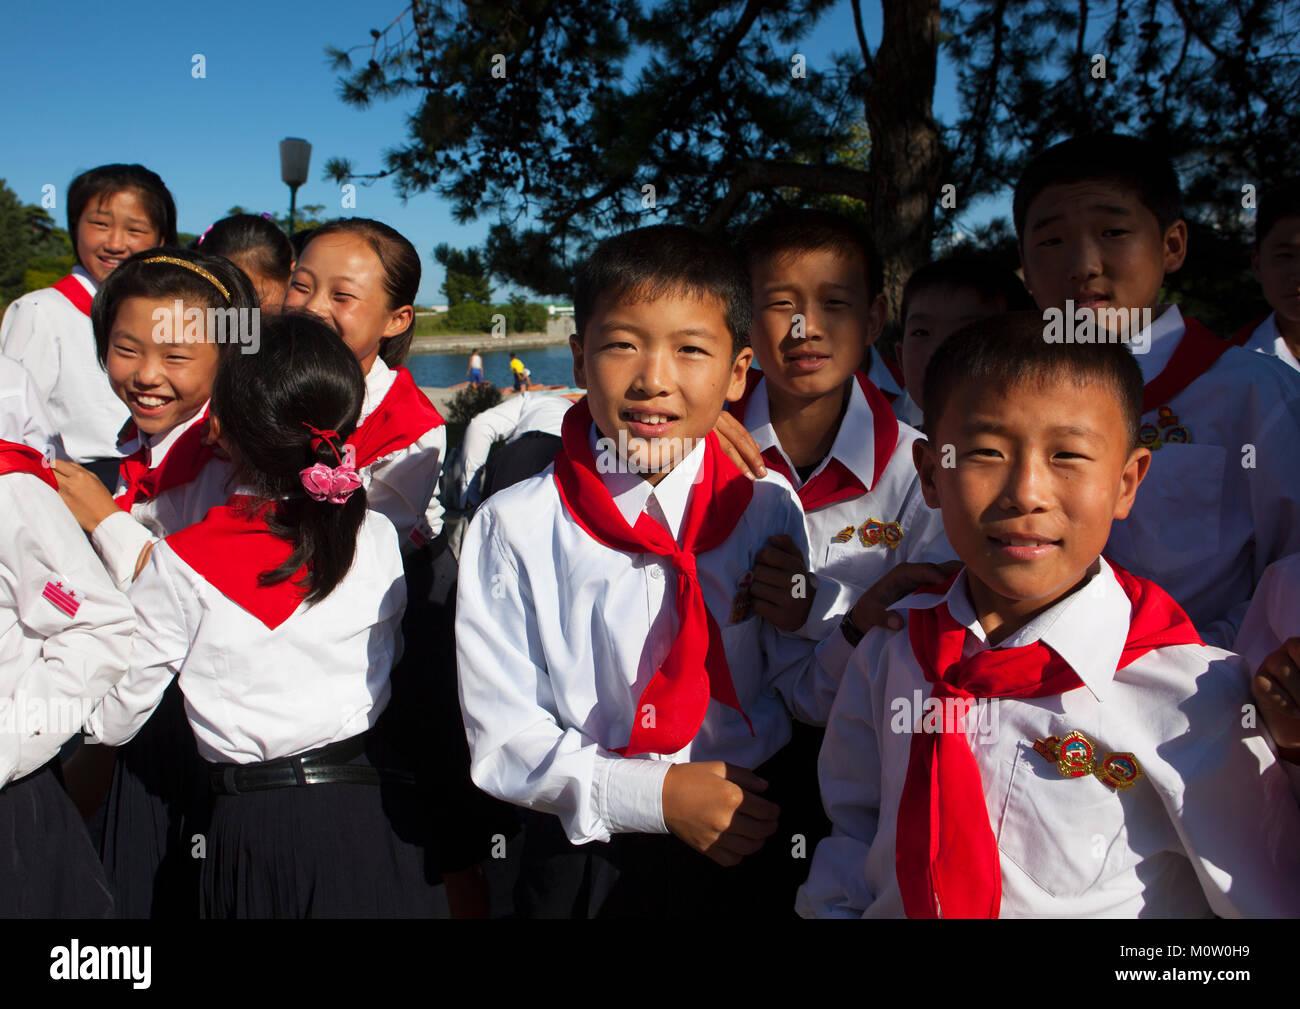 North Korean pioneers in Songdowon international children's camp, Kangwon Province, Wonsan, North Korea - Stock Image